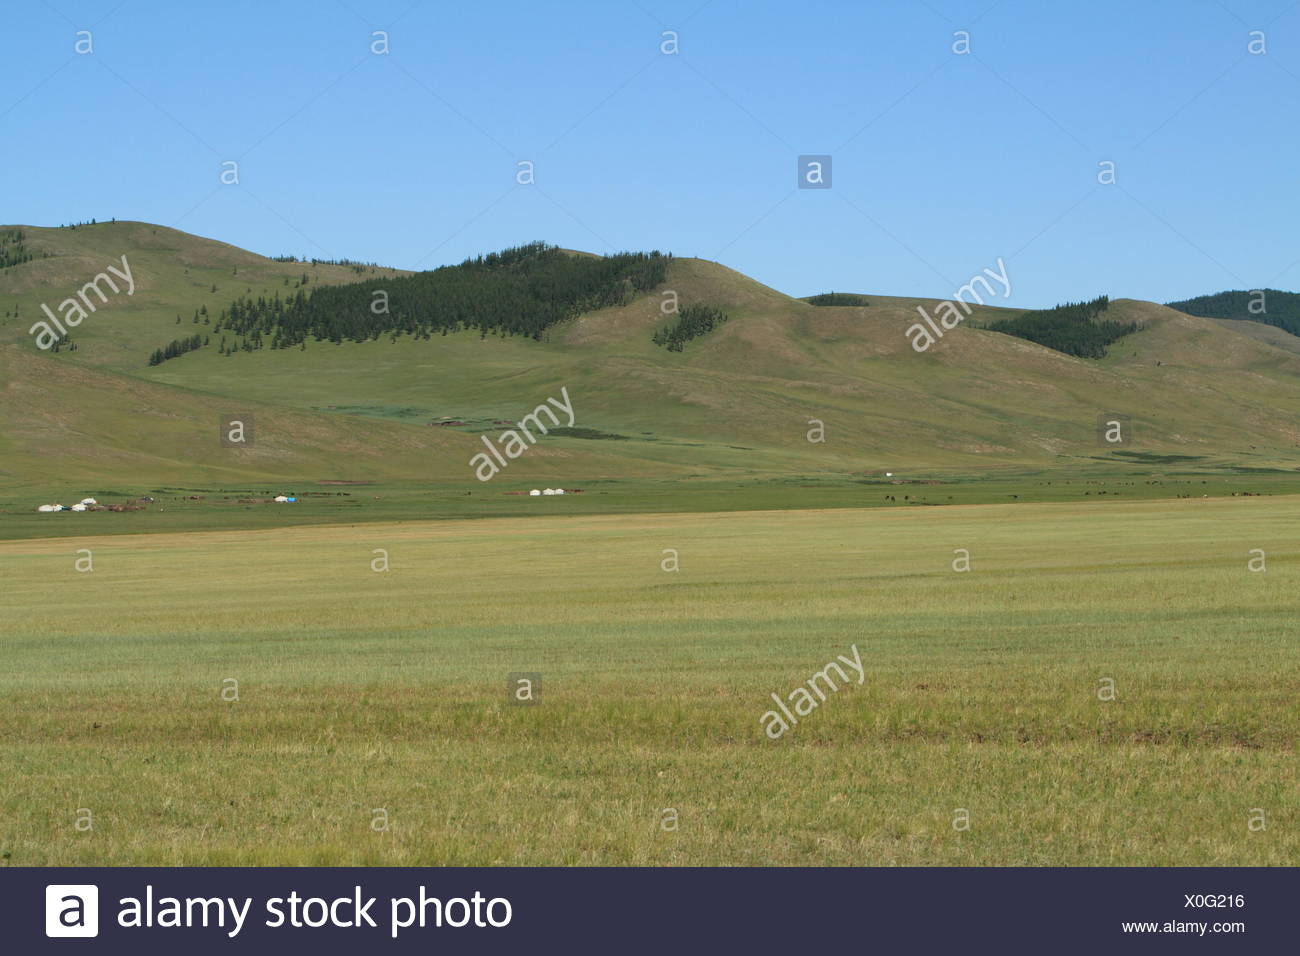 mongolian landscapes - Stock Image